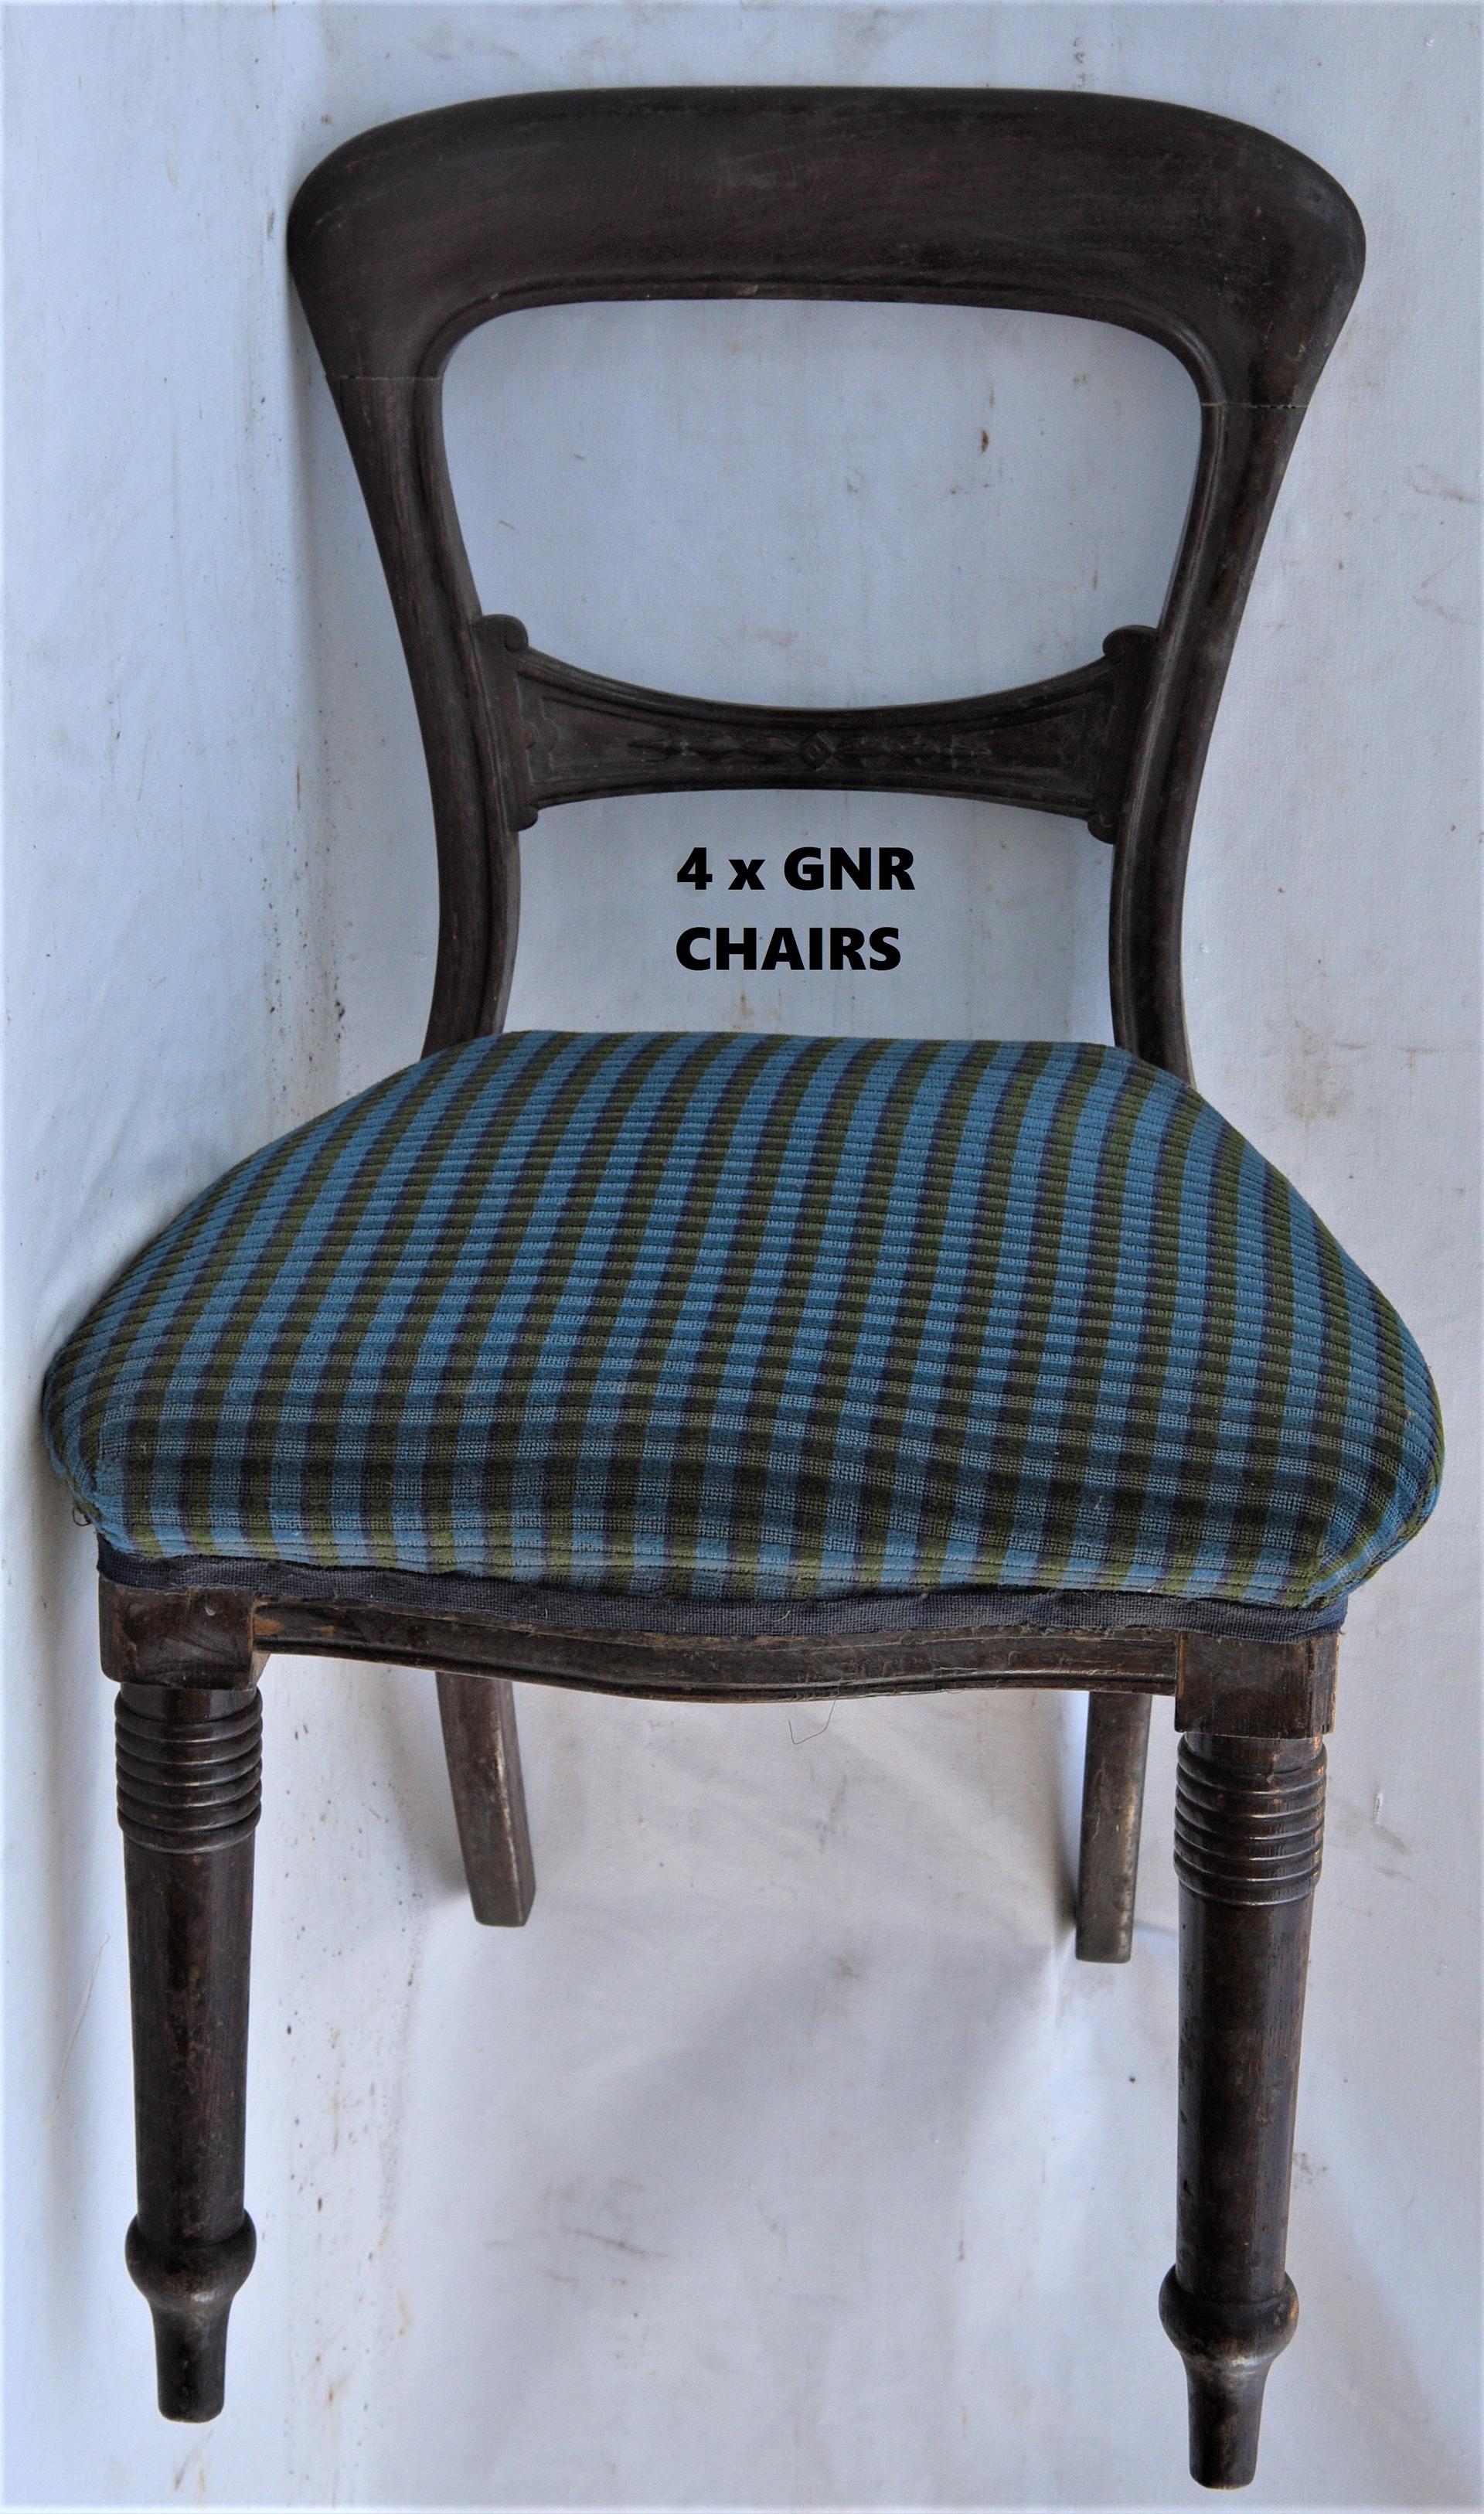 4 x GNR Mahogany waiting room chairs.